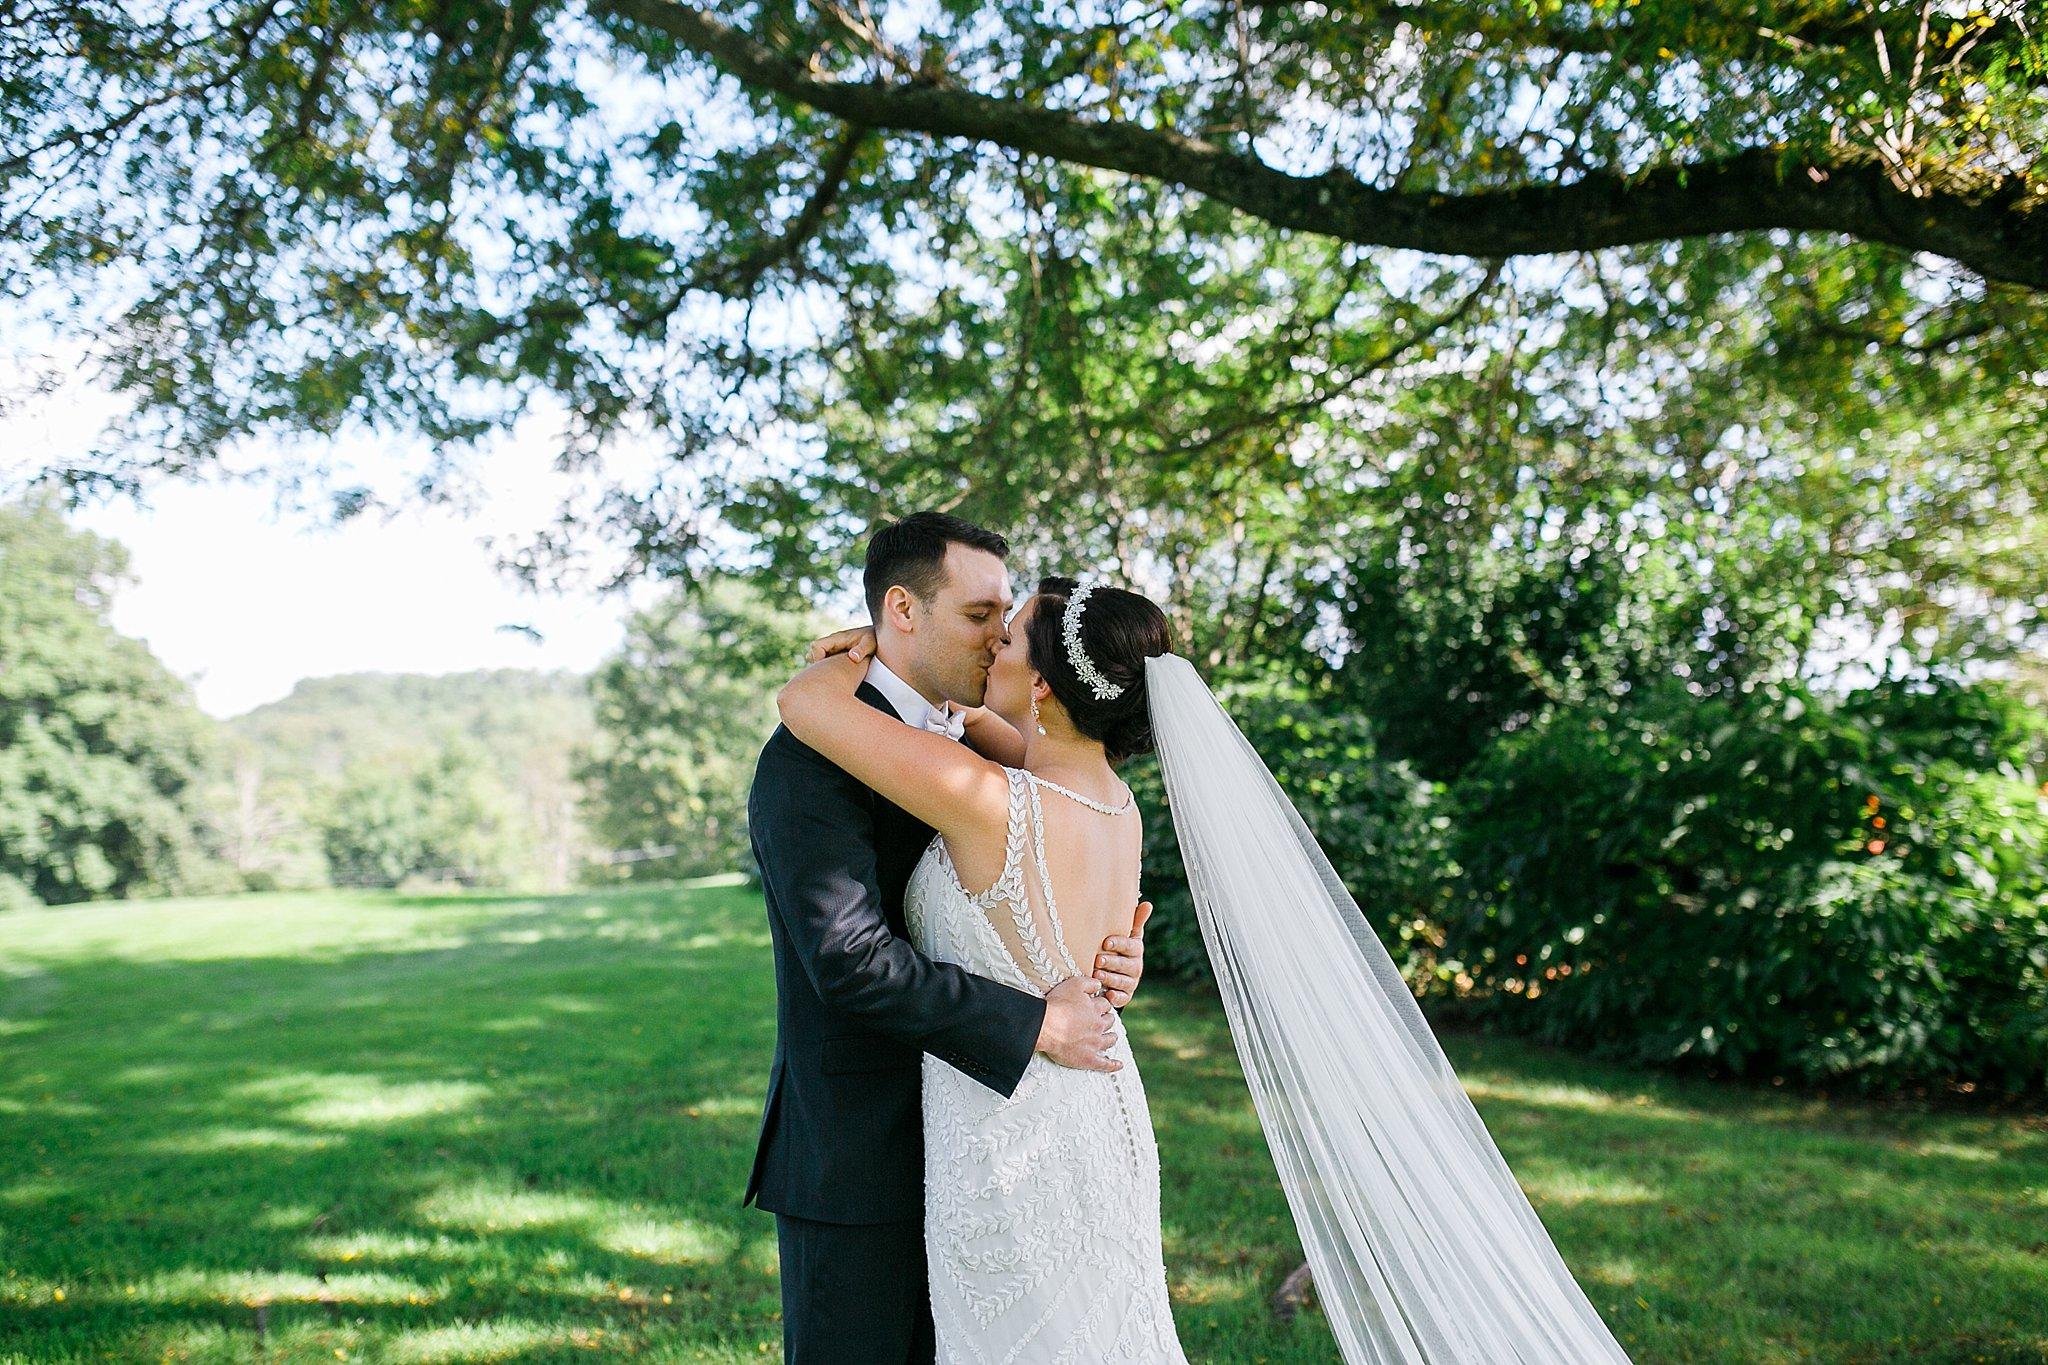 West Hills Country Club Wedding Gatsby Wedding Roaring Twenties Wedding Hudson Valley Wedding Photographer Sweet Alice Photography17.jpg